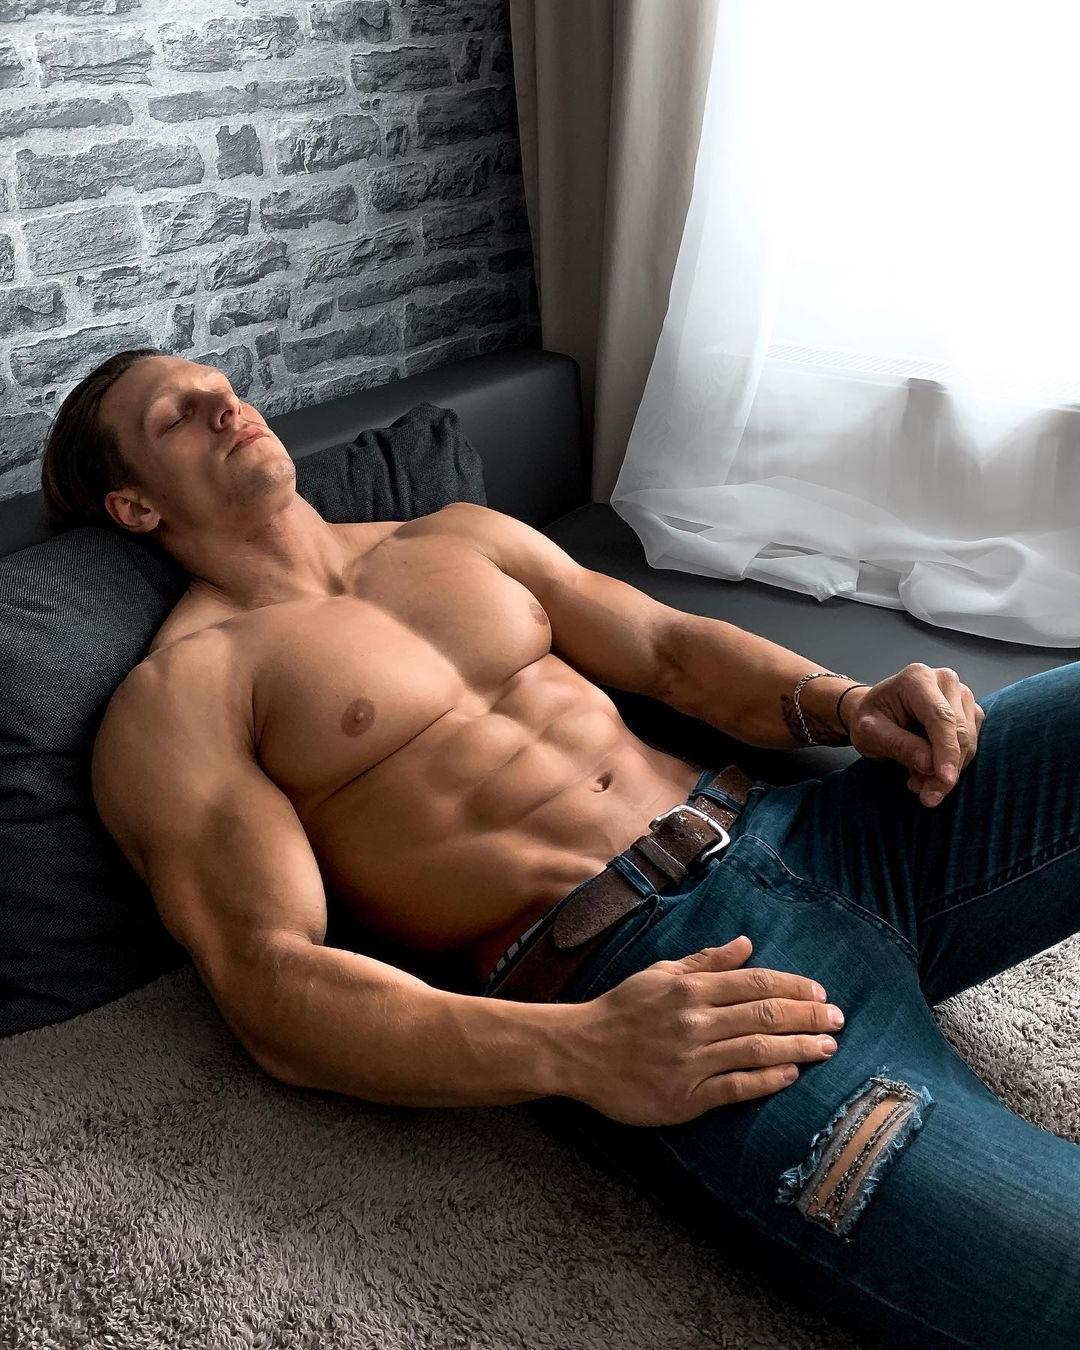 hot-guys-big-pecs-steve-kris-perfect-upper-body-shirtless-muscle-hunk-sleeping